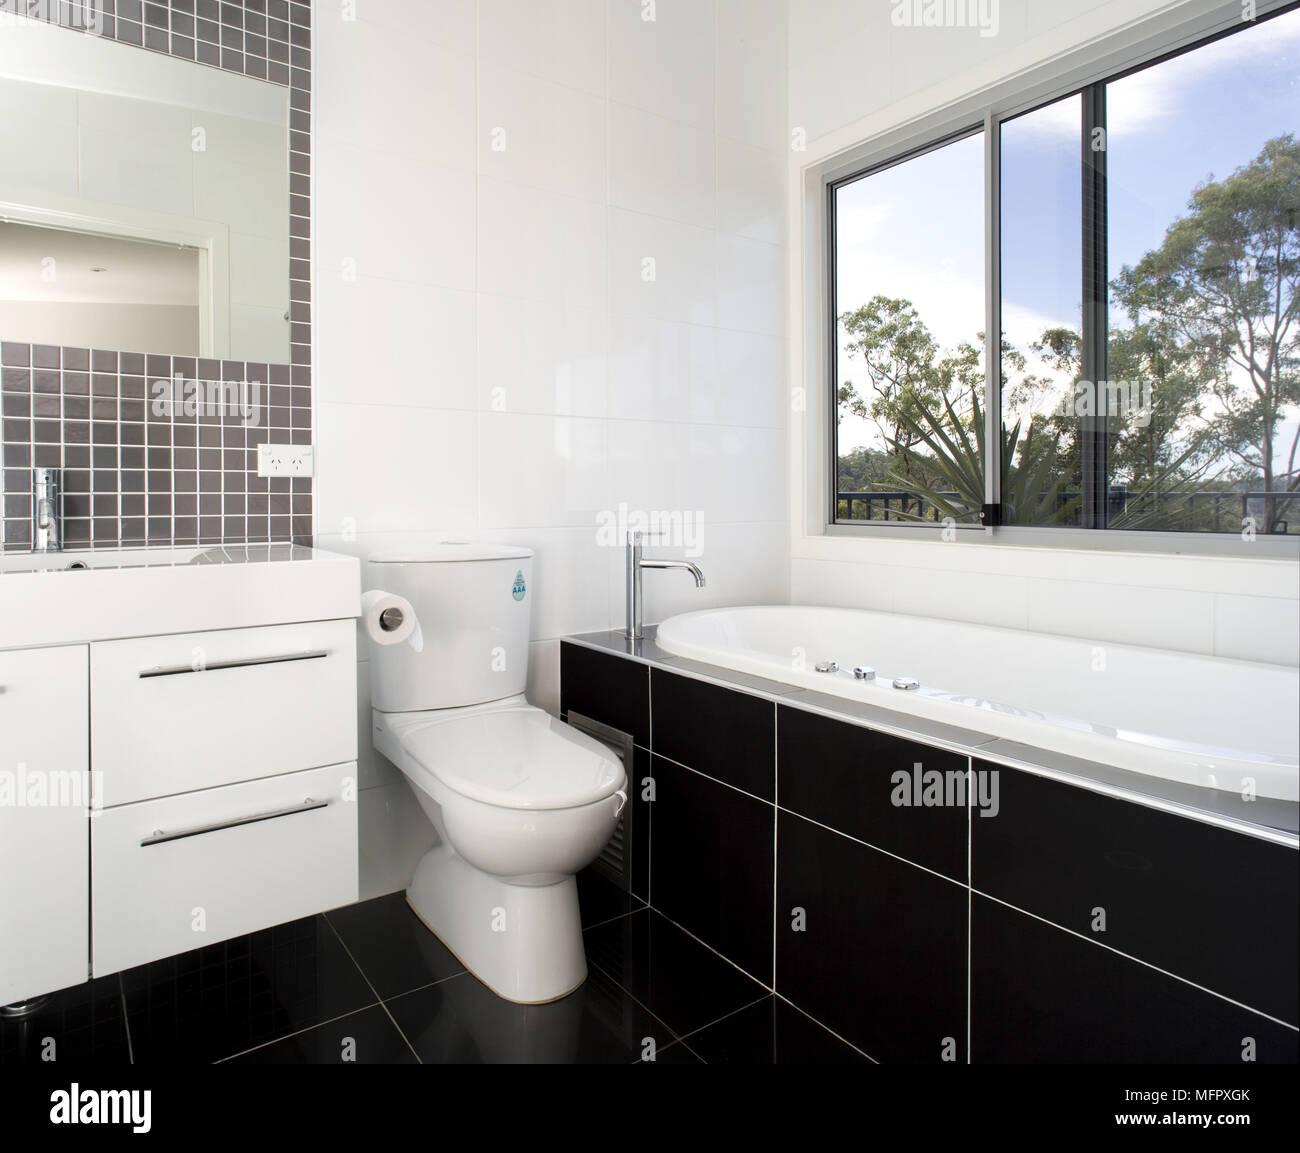 Washbasin set in cupboard unit next to toilet and bathtub in modern white bathroom Stock Photo